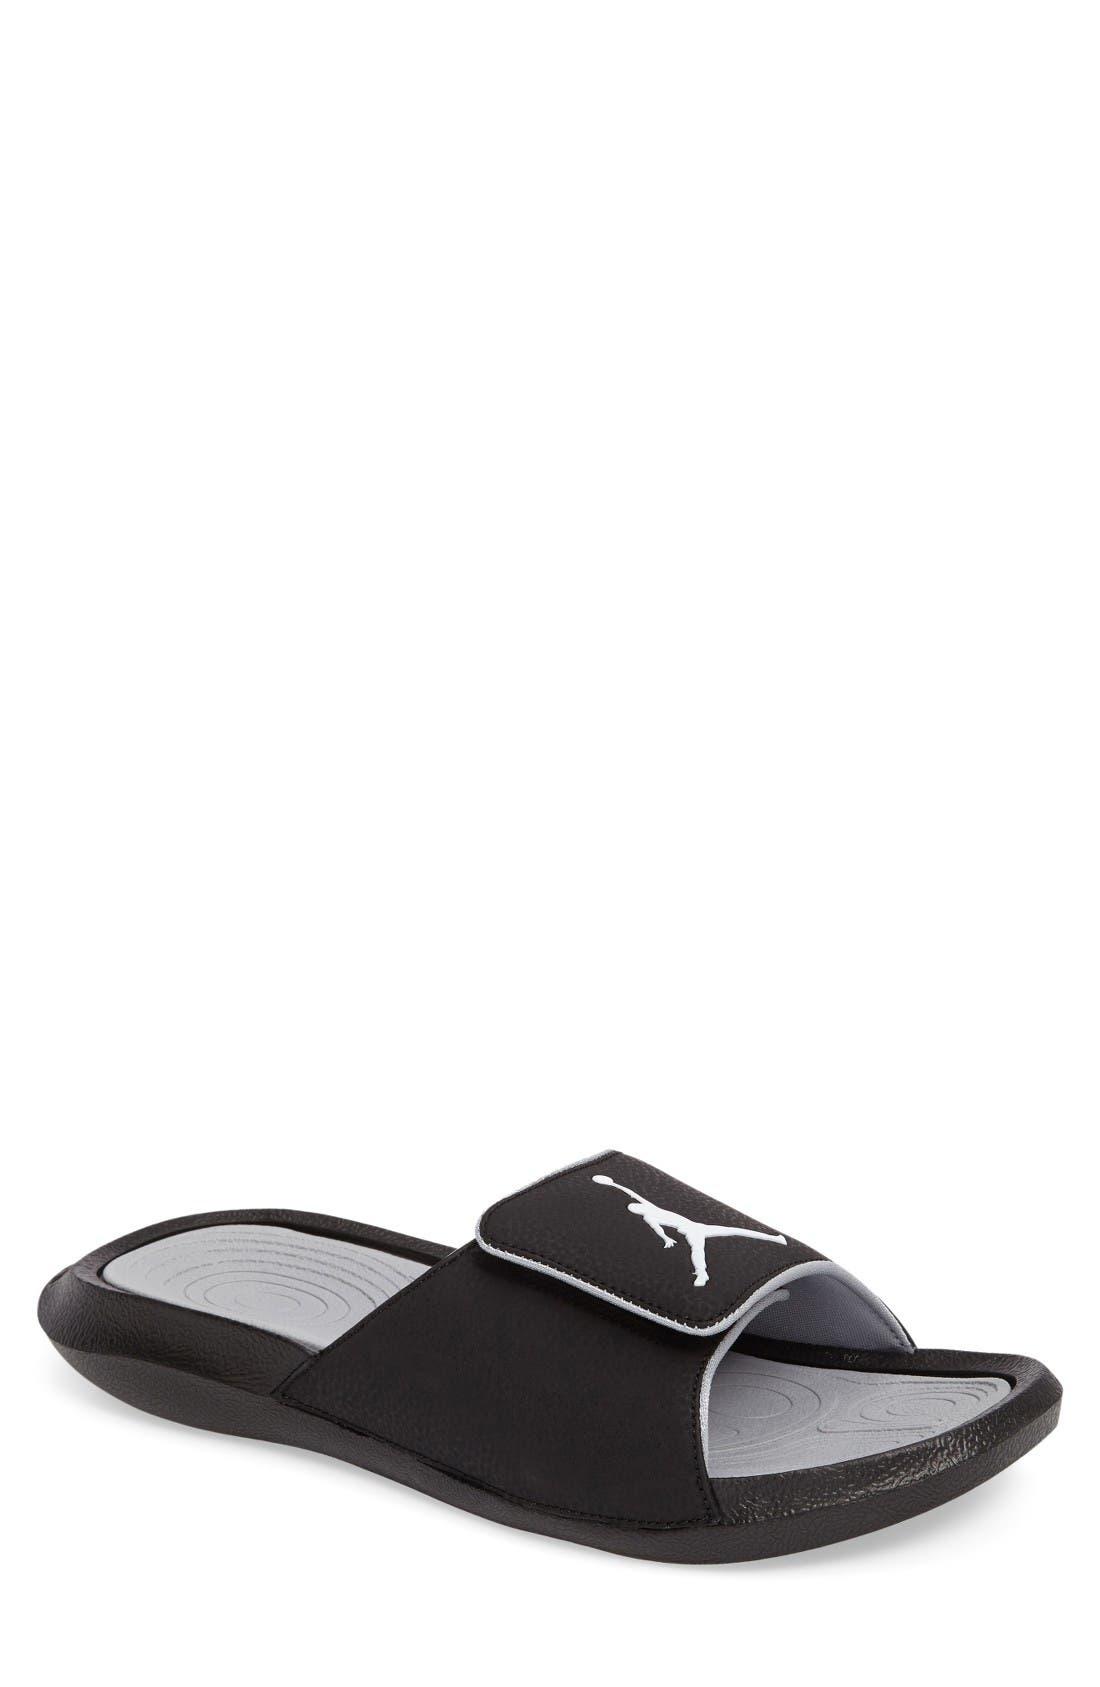 Main Image - Nike Jordan Hydro 6 Slide Sandal (Men)